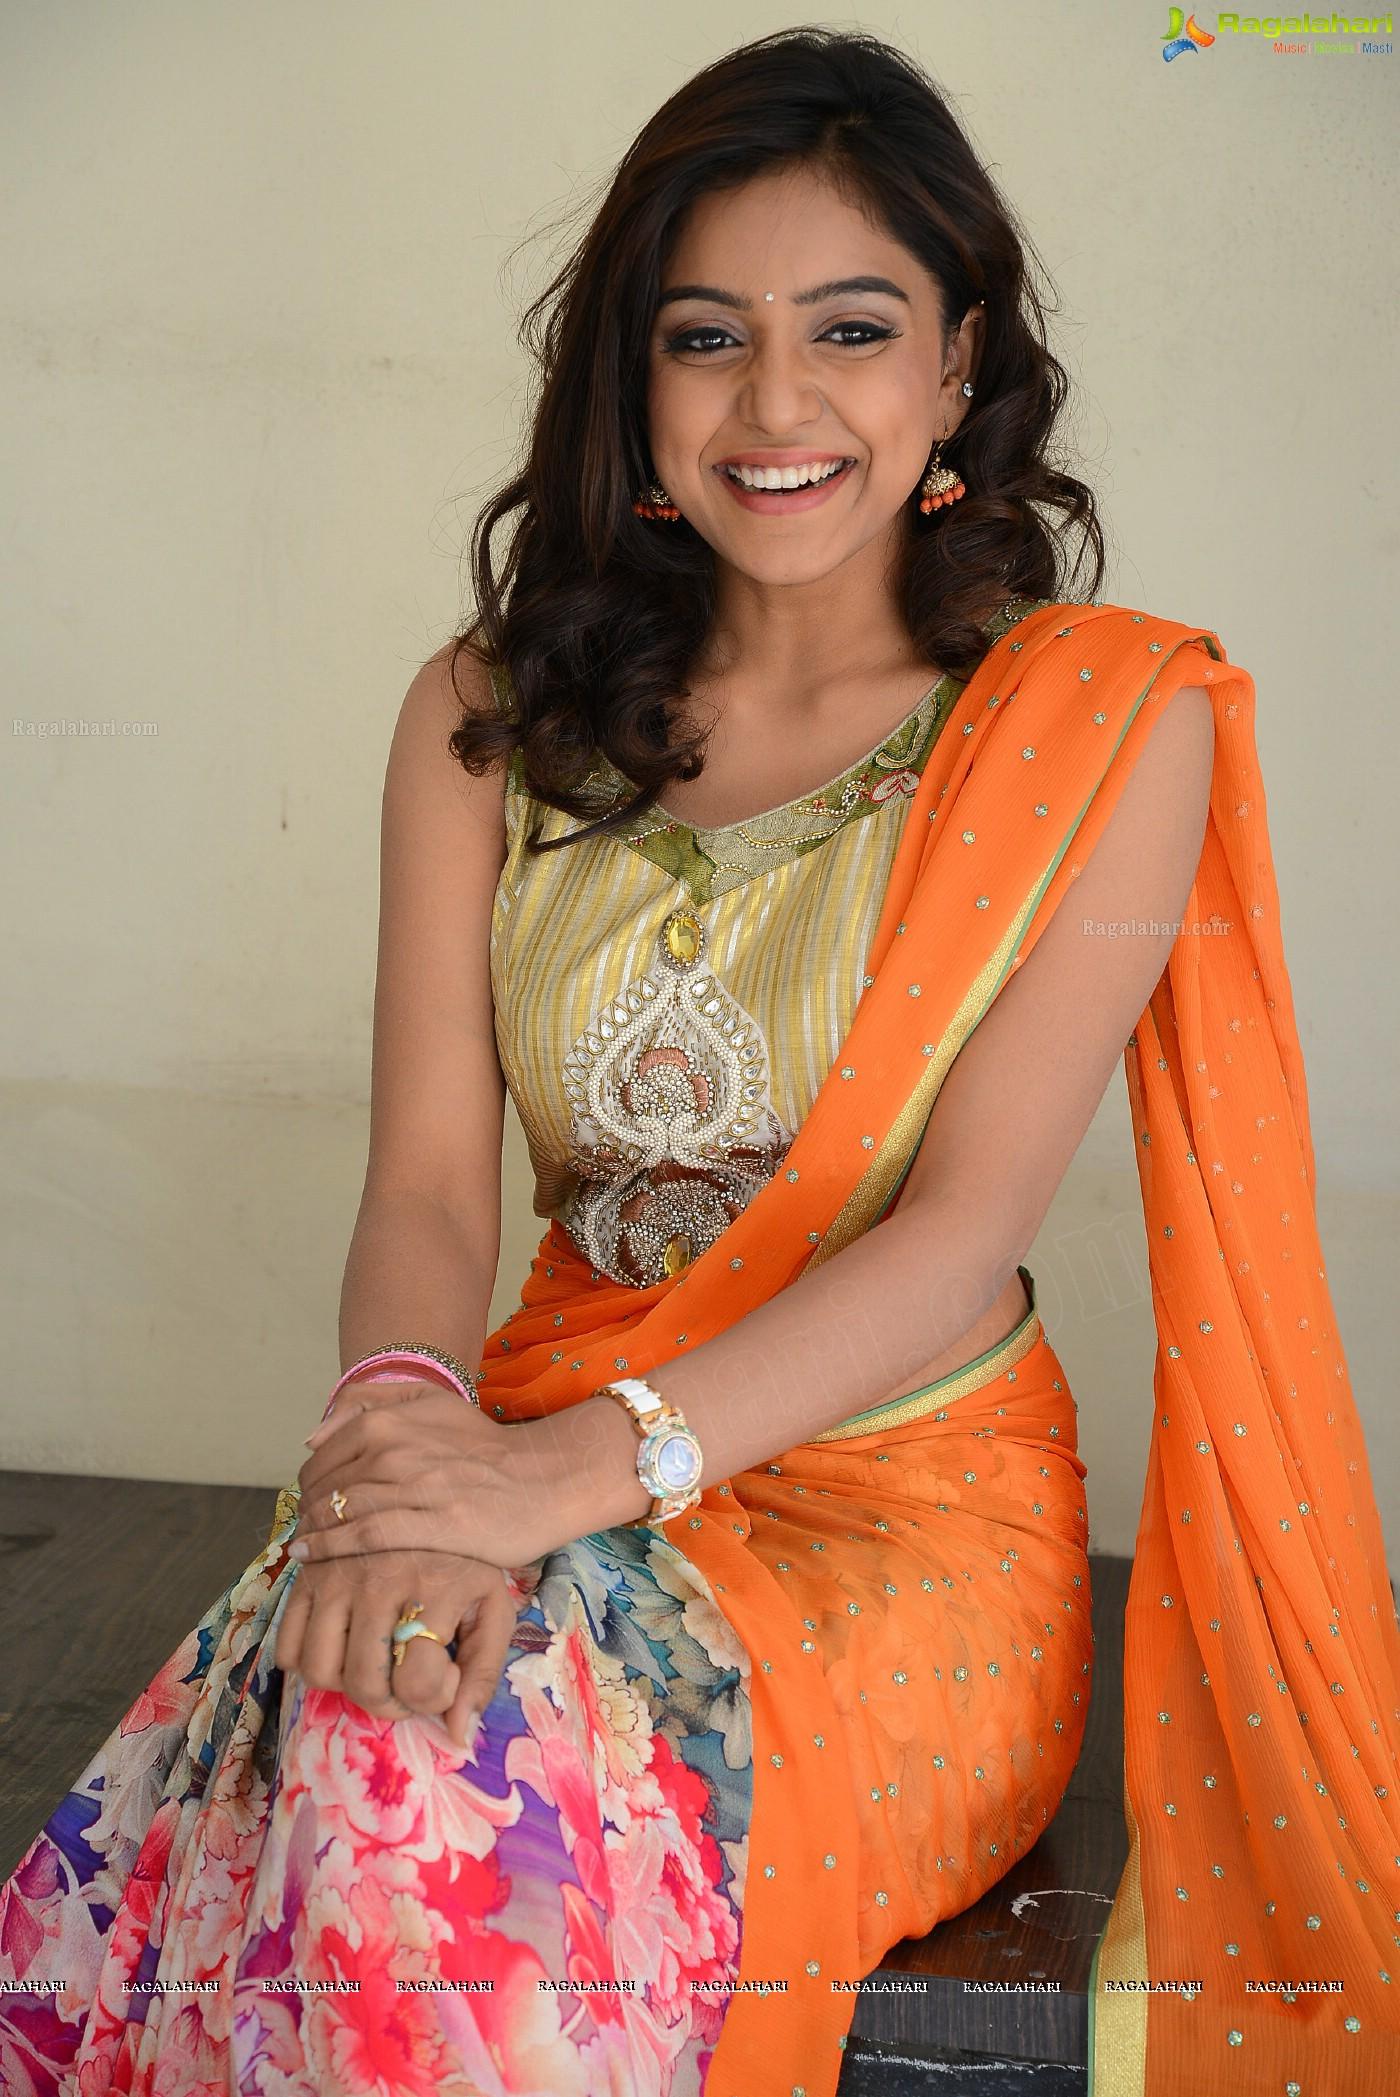 Vithika Sheru Vithika Sheru new picture